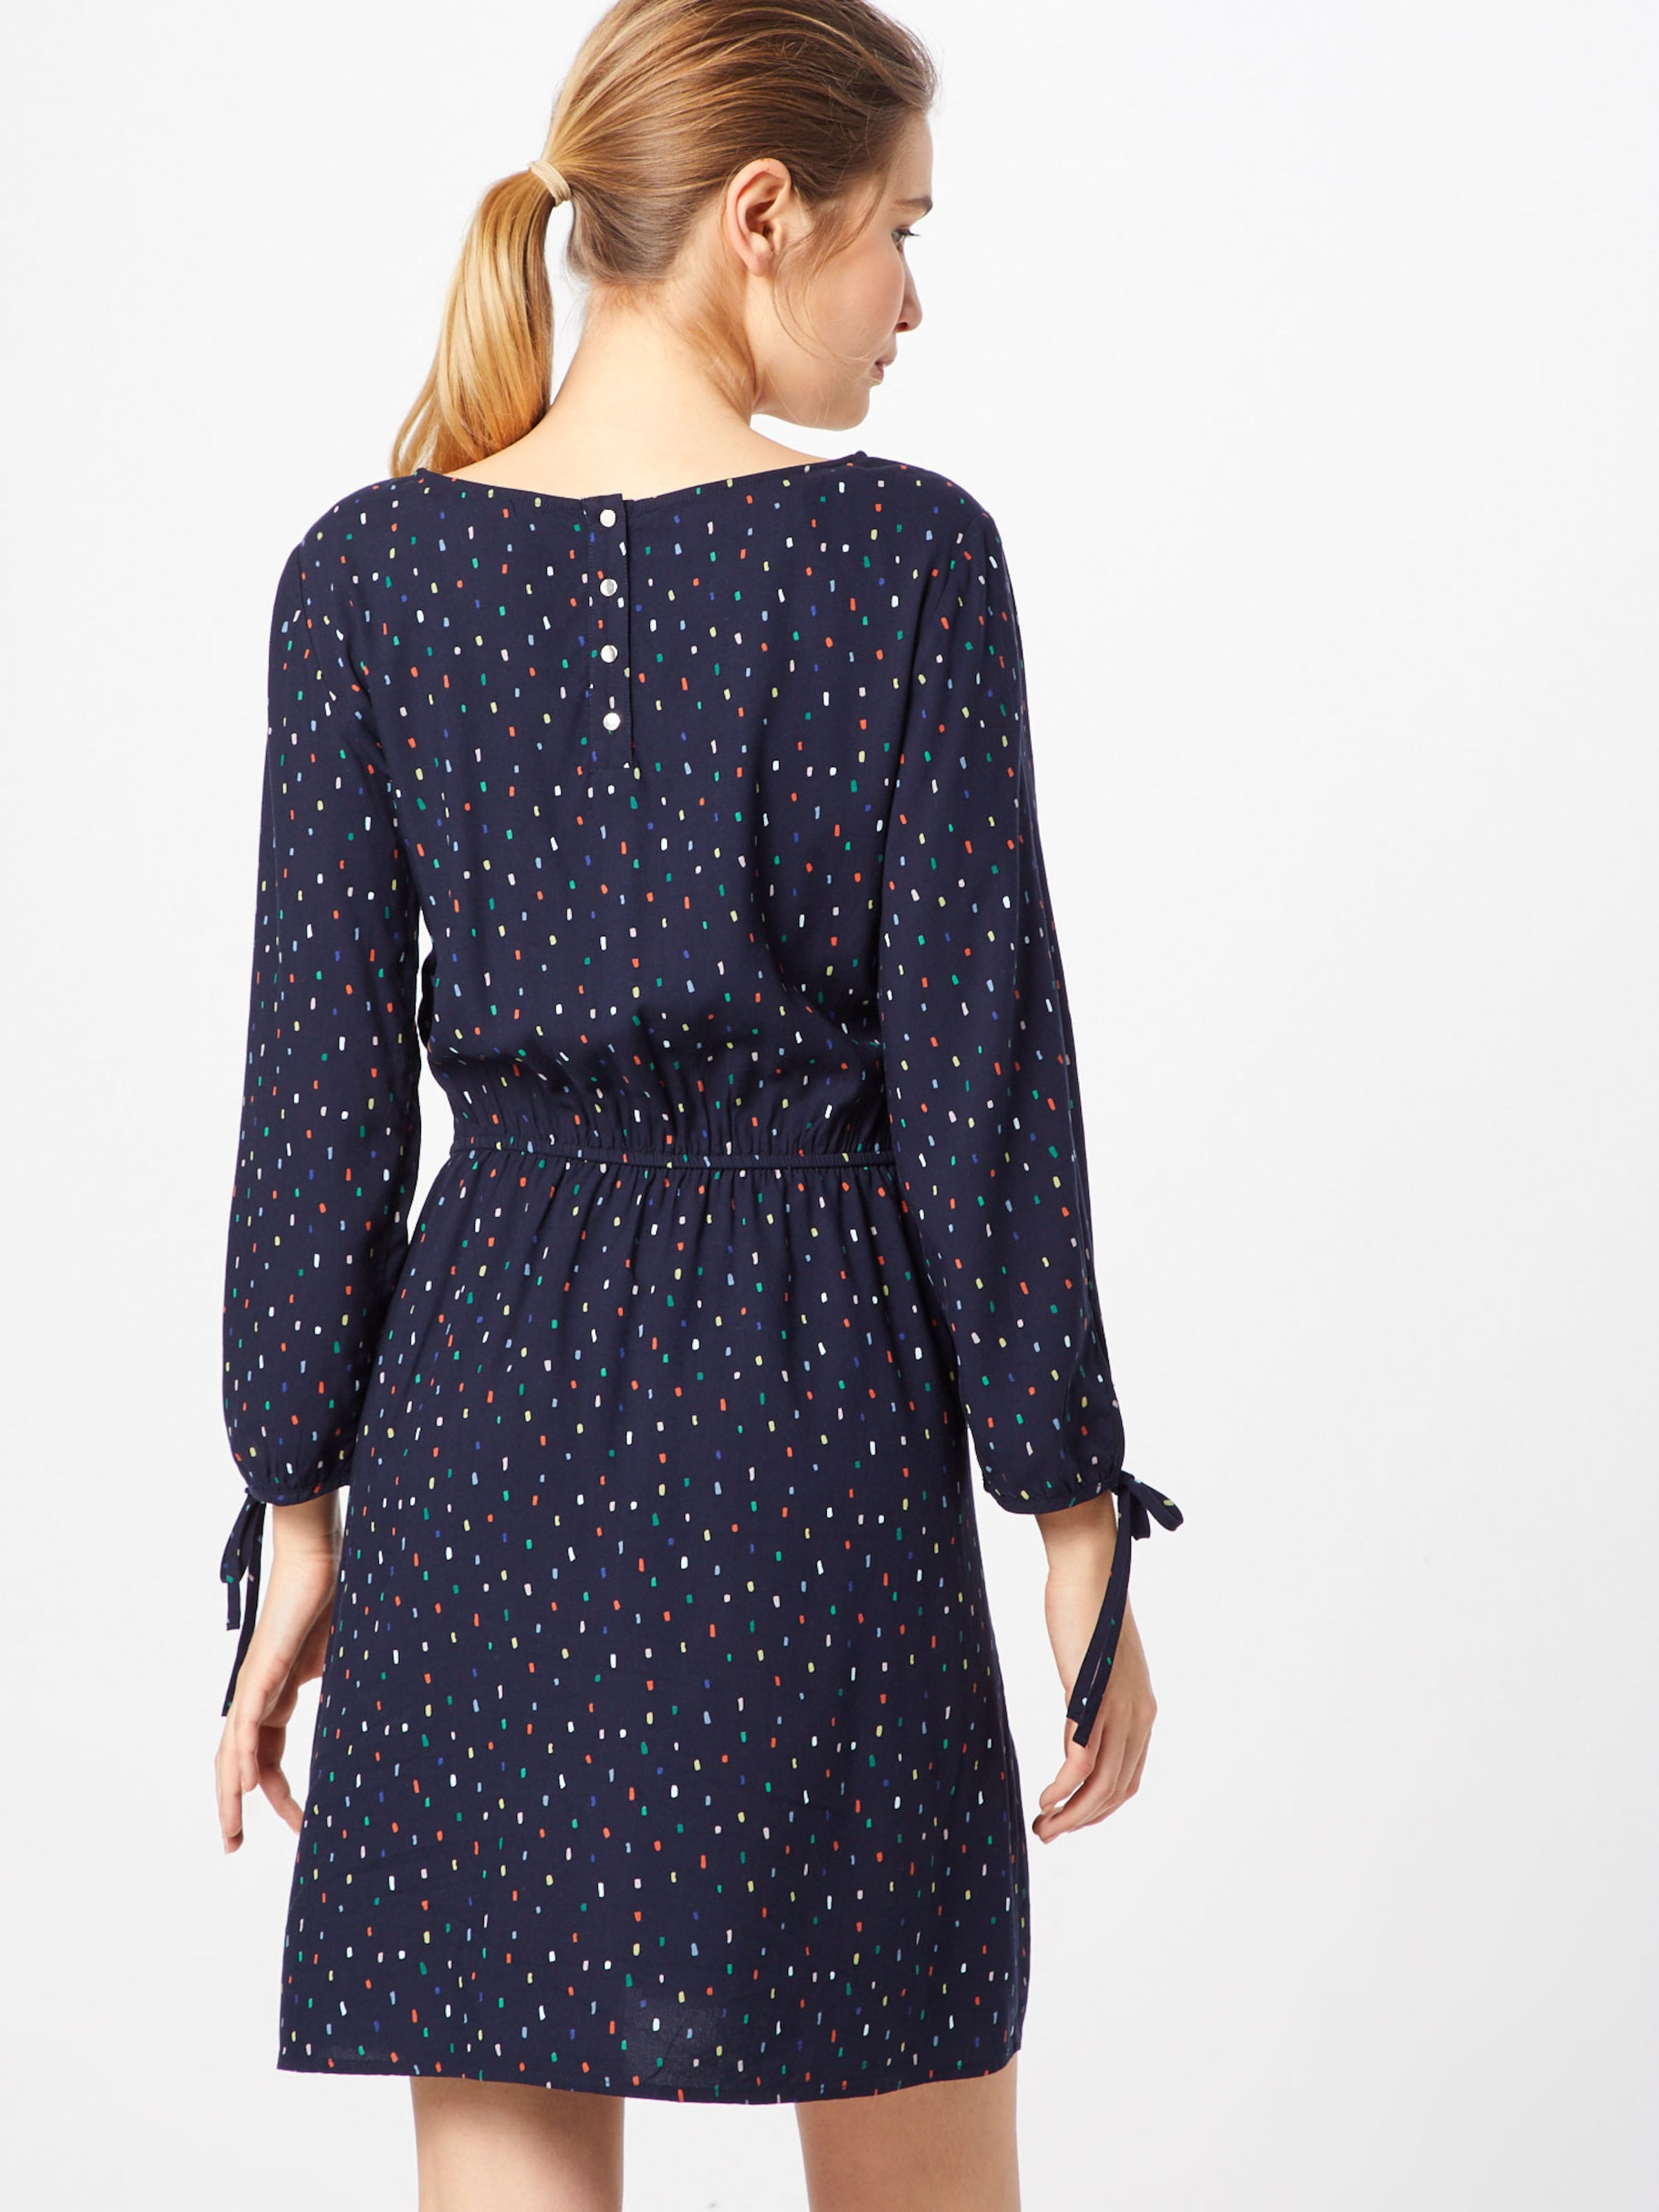 Dress' Mini En Nuit Tailor Bleu Tom Robe Denim D'été 'printed jRL34Acq5S